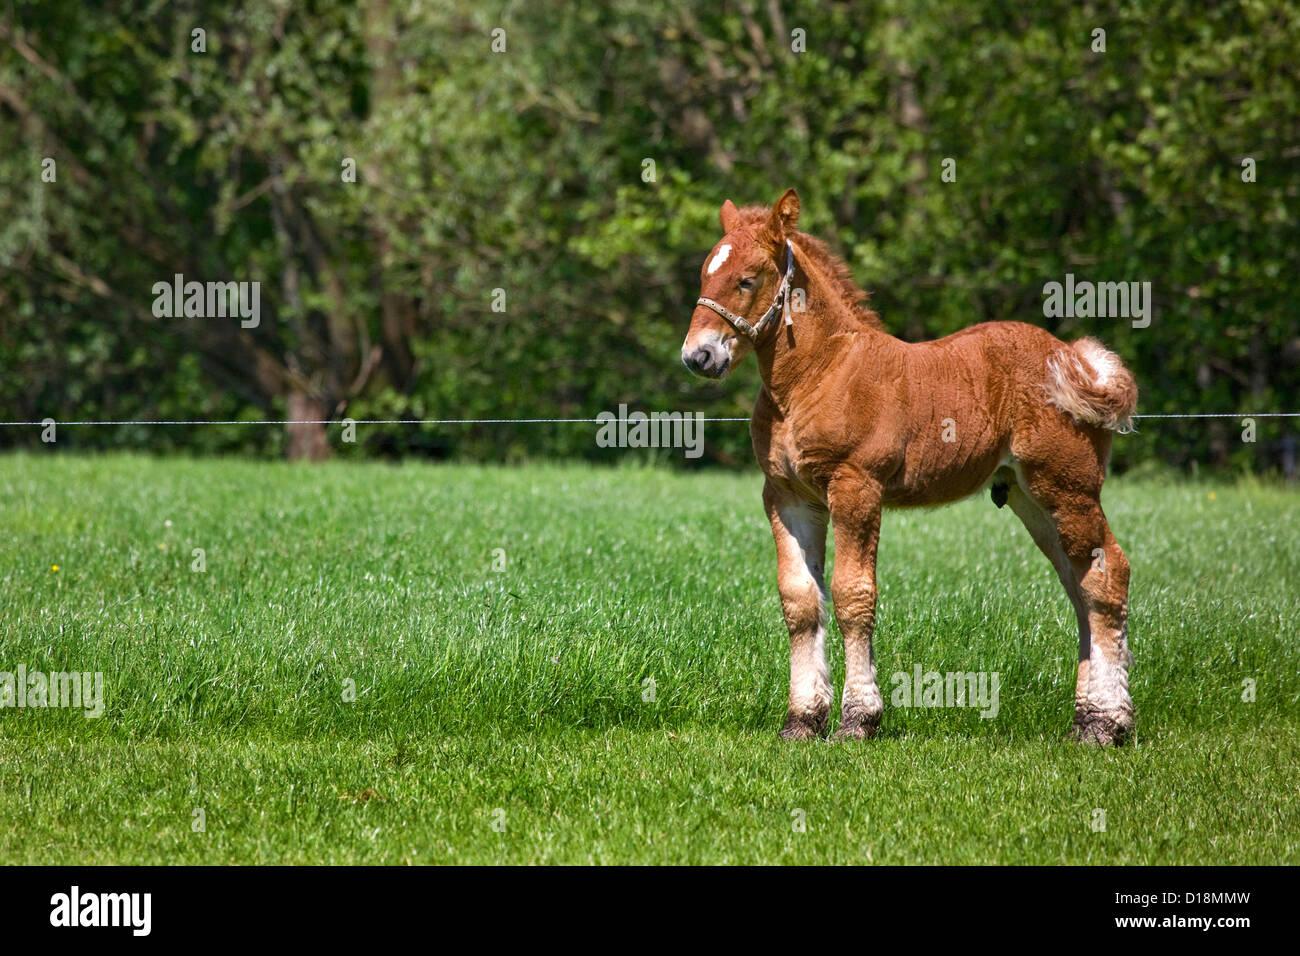 Belgian draft horse / Belgian Heavy Horse / Brabançon / Brabant, foal in pasture, Belgium - Stock Image